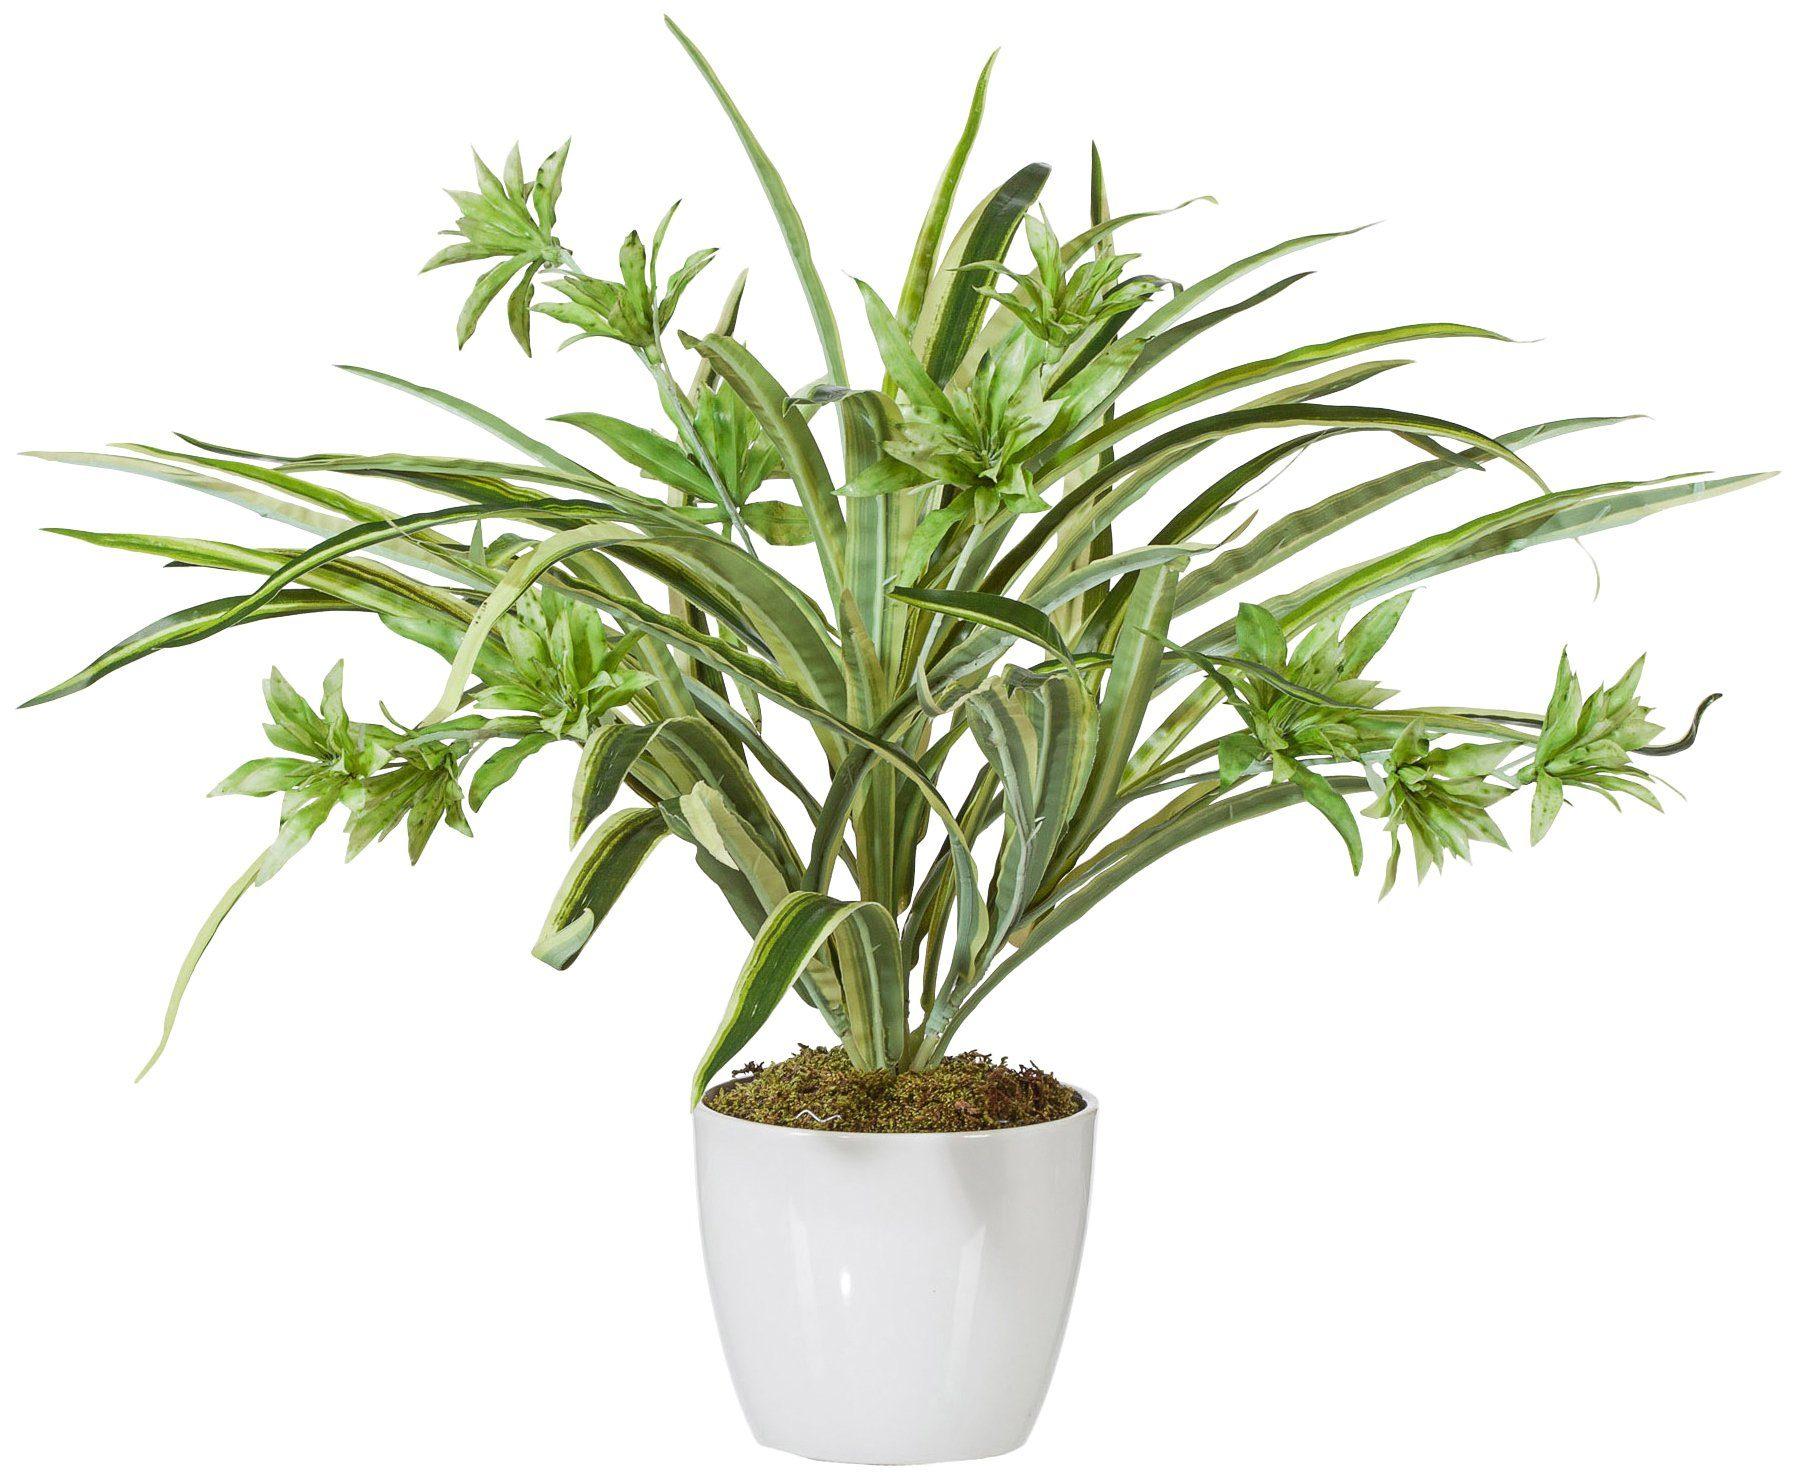 Kunstpflanze »Grünlilie Chlorophythum«, im Keramiktopf, Höhe 40 cm